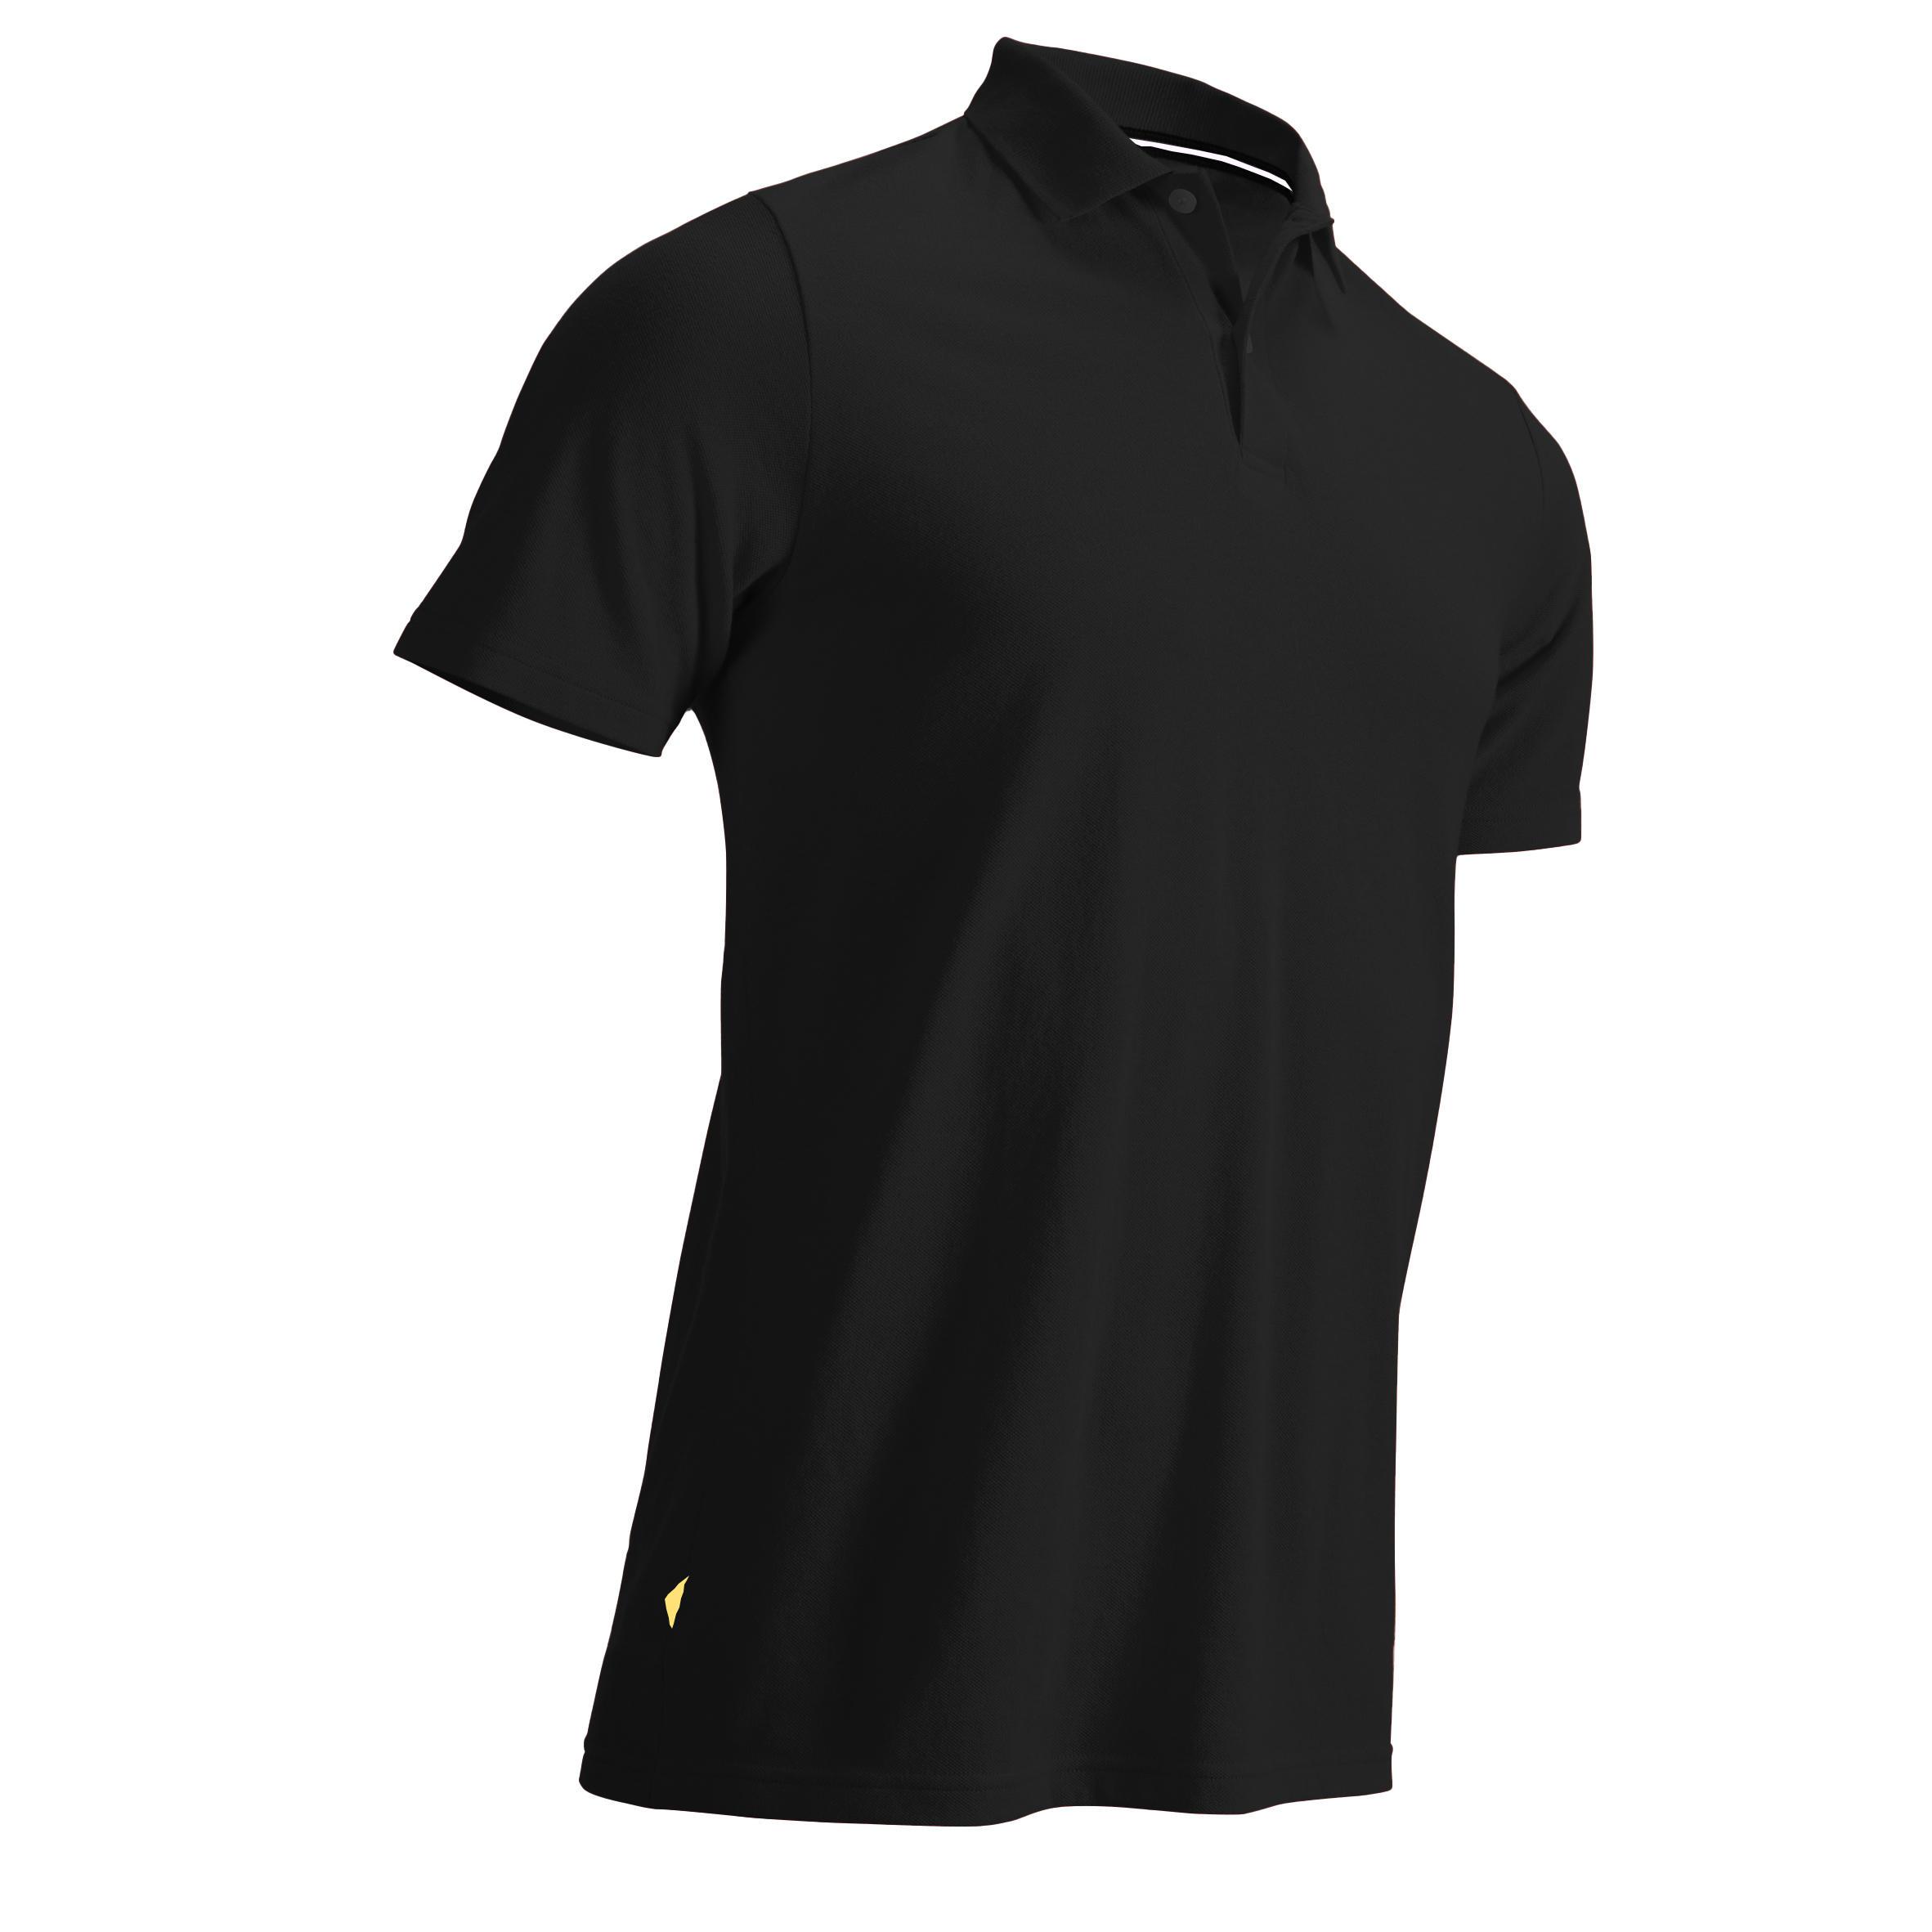 Tricou Polo Negru Bărbați la Reducere poza